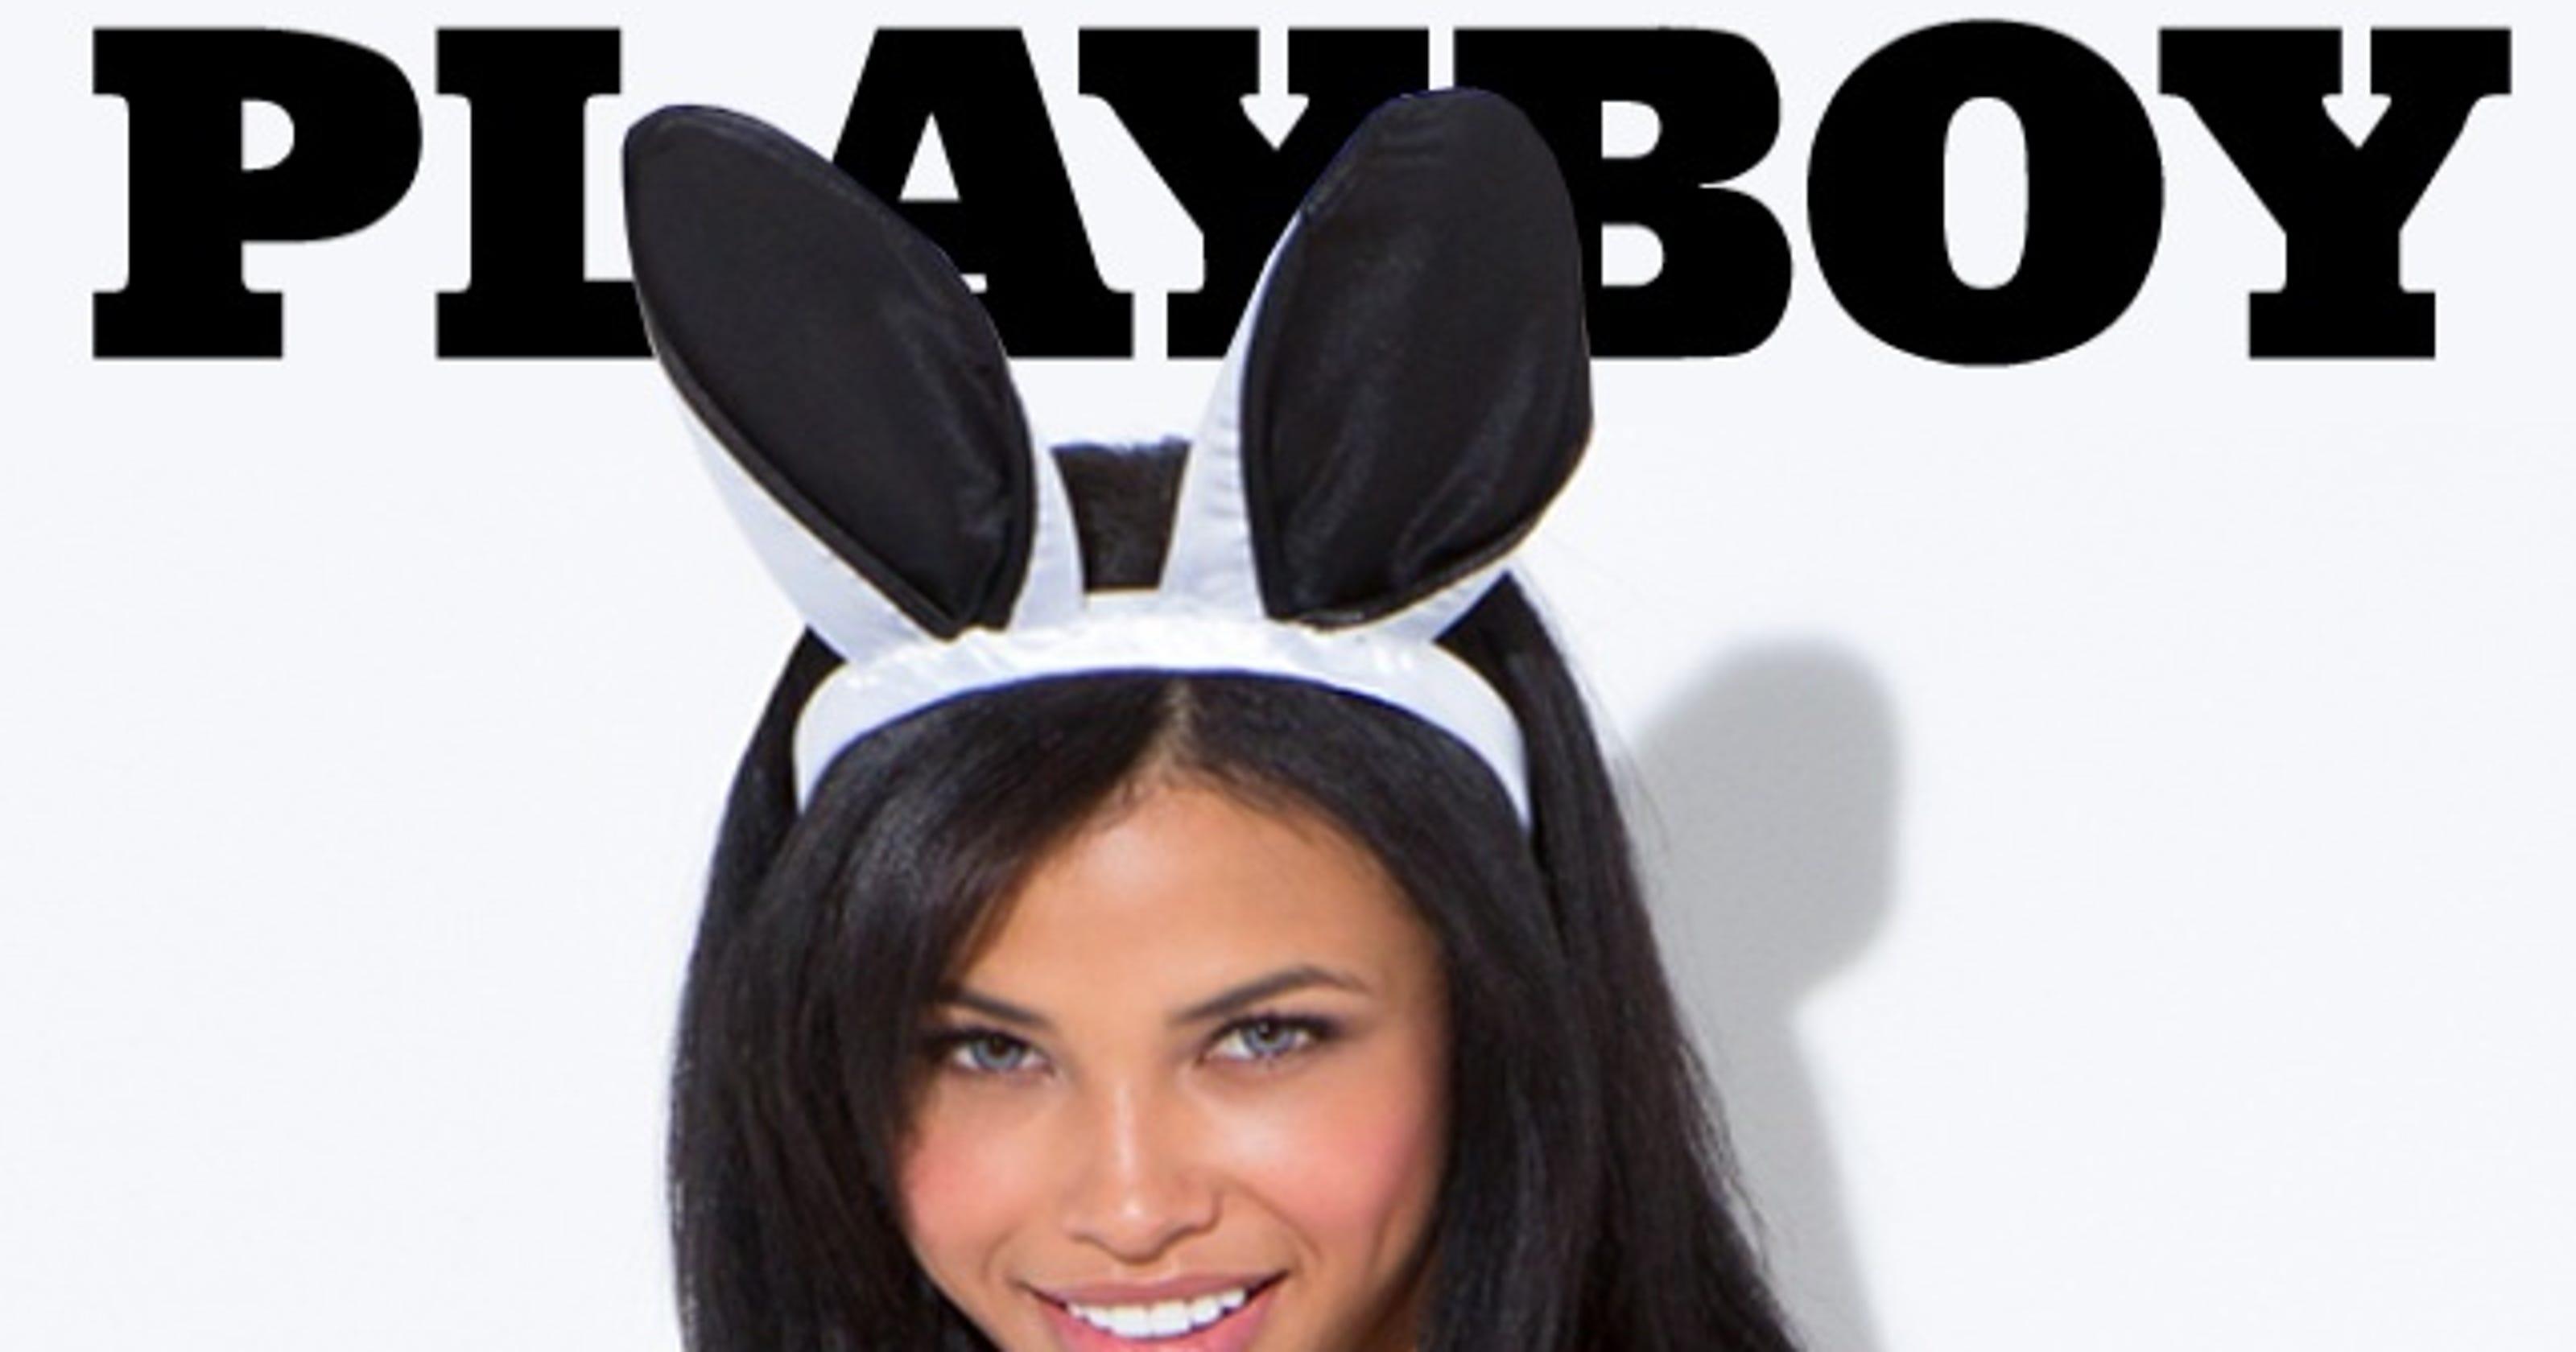 Playboy picks its top party school: WVU